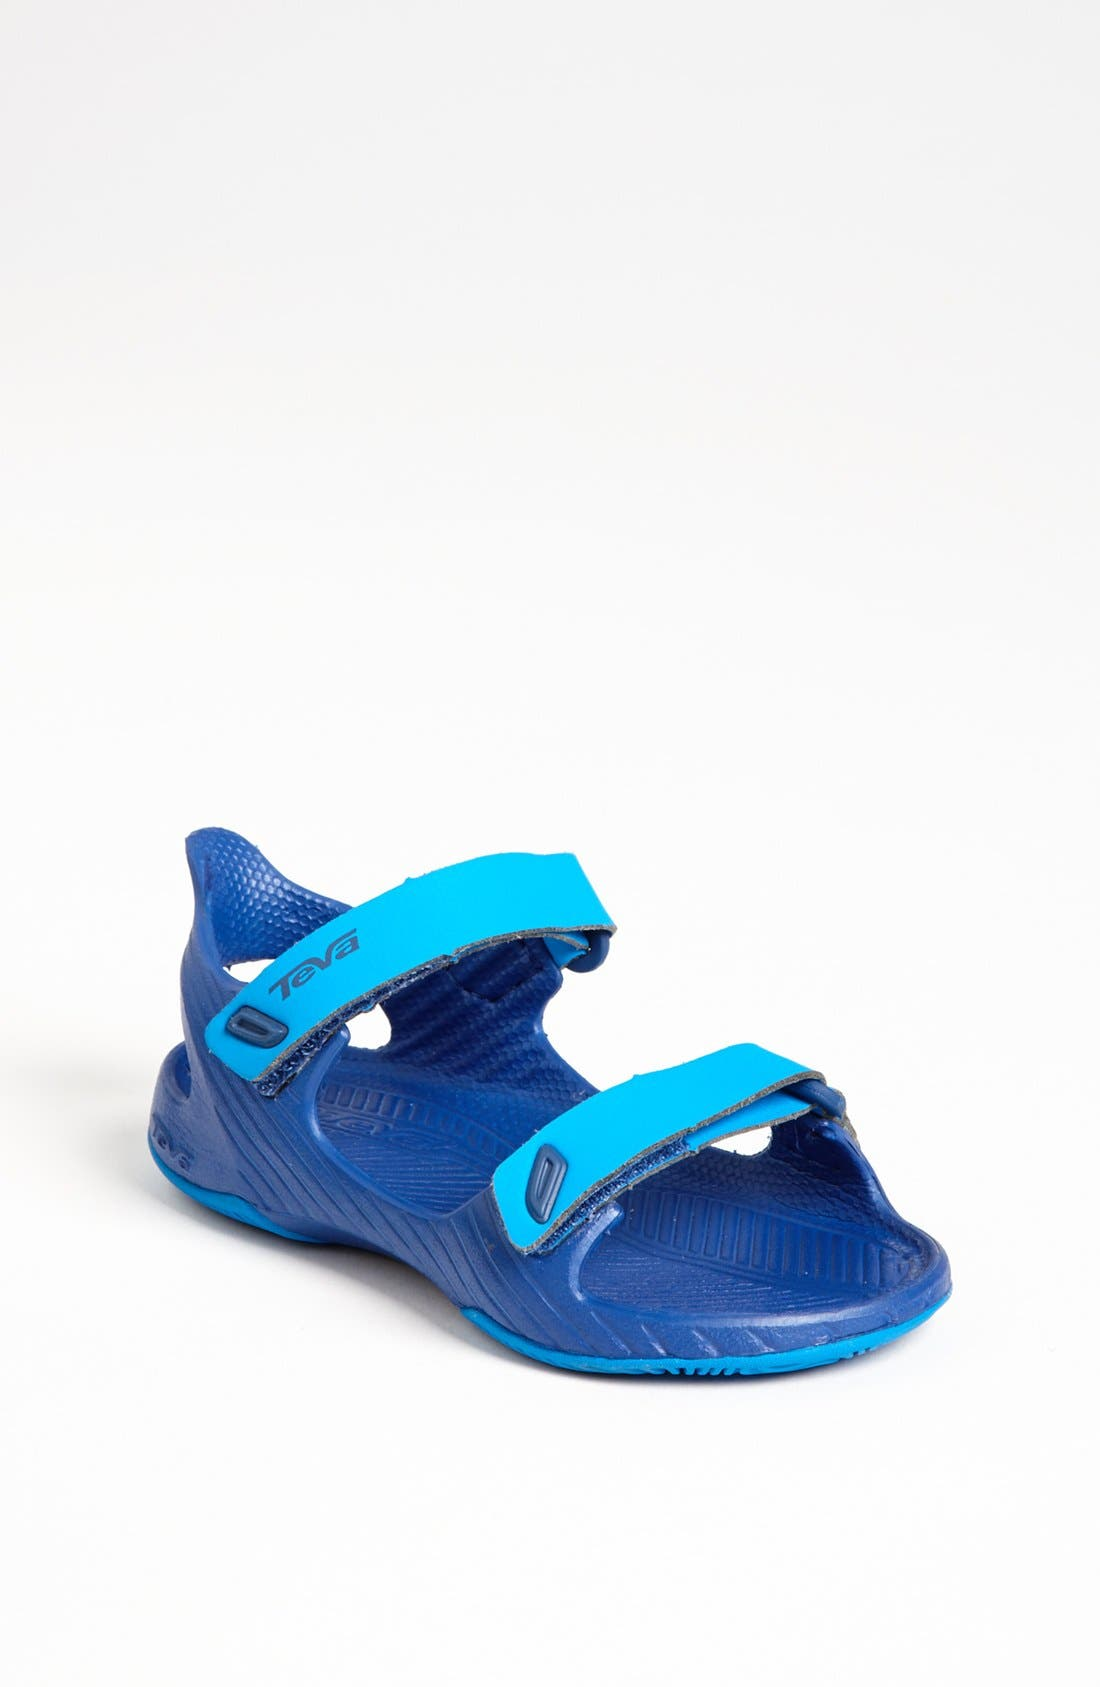 Main Image - Teva 'Barracuda' Sandal (Baby & Walker)